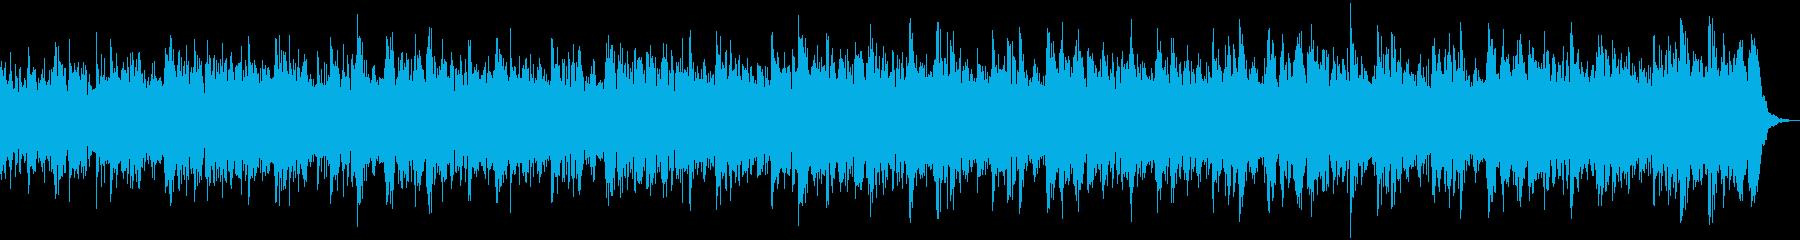 【CM】クールなエレクトロBGM・10の再生済みの波形